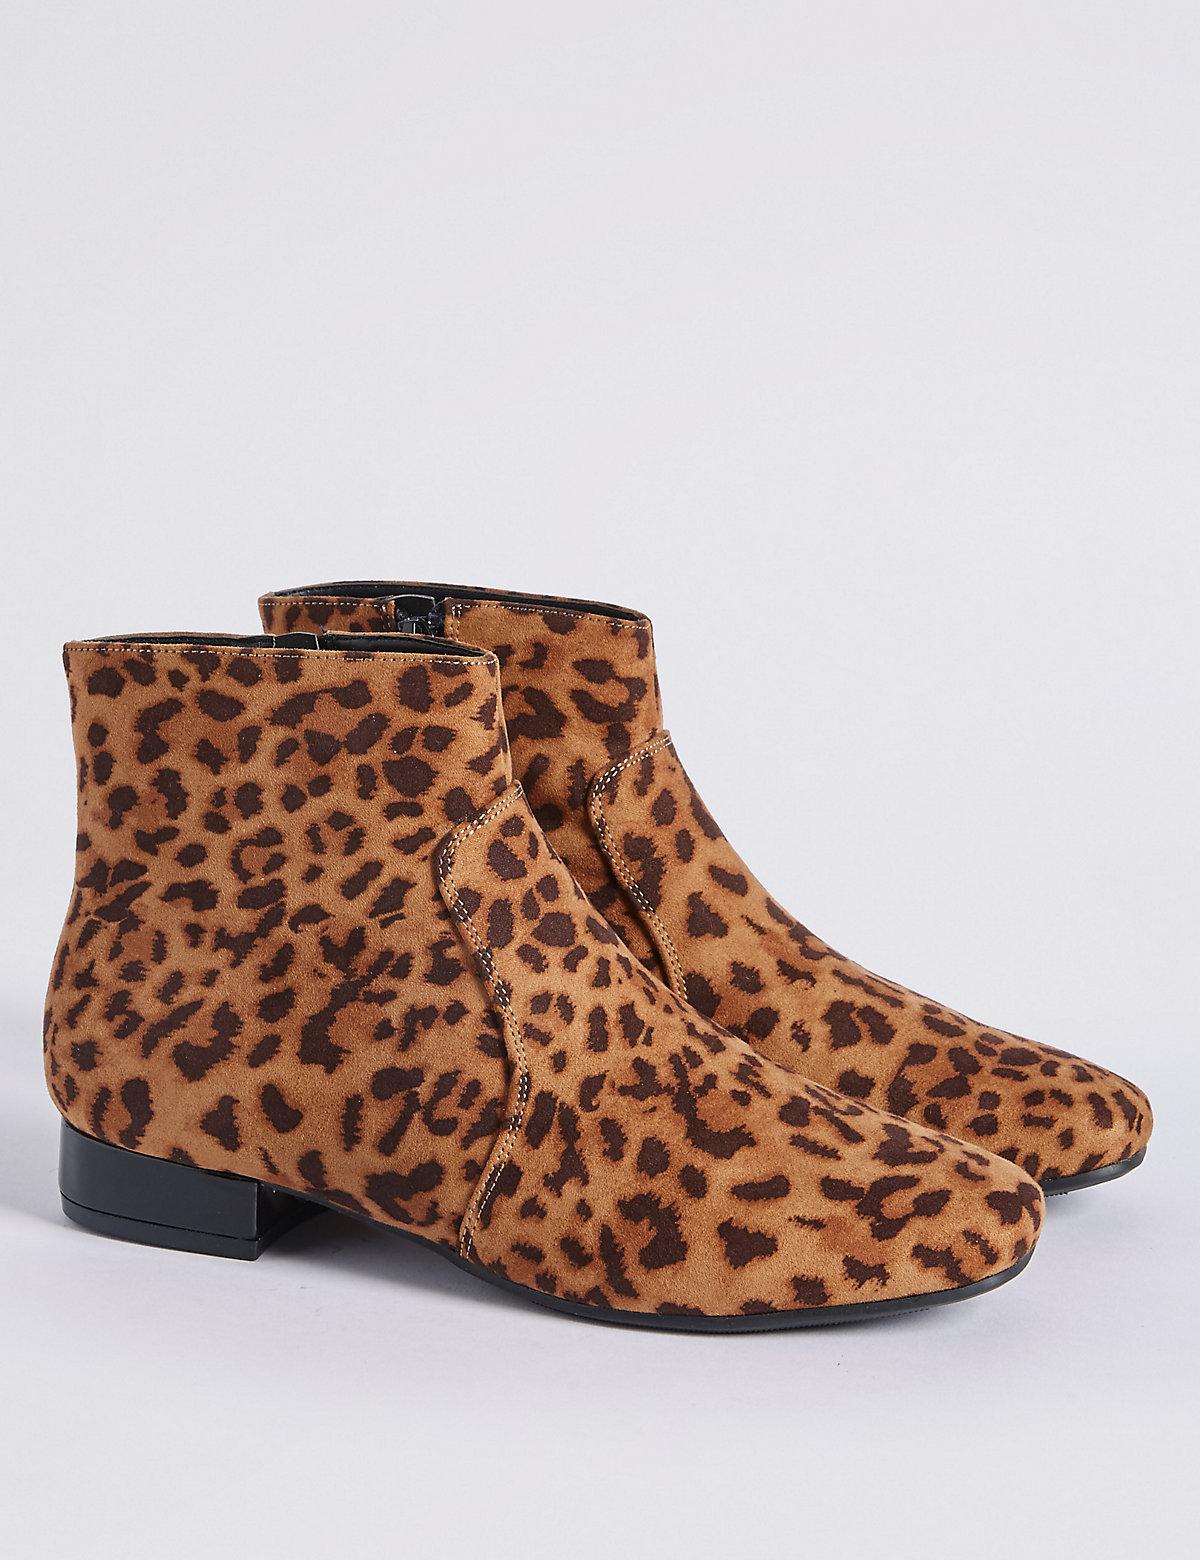 Kids' Leopard Print Ankle Boots